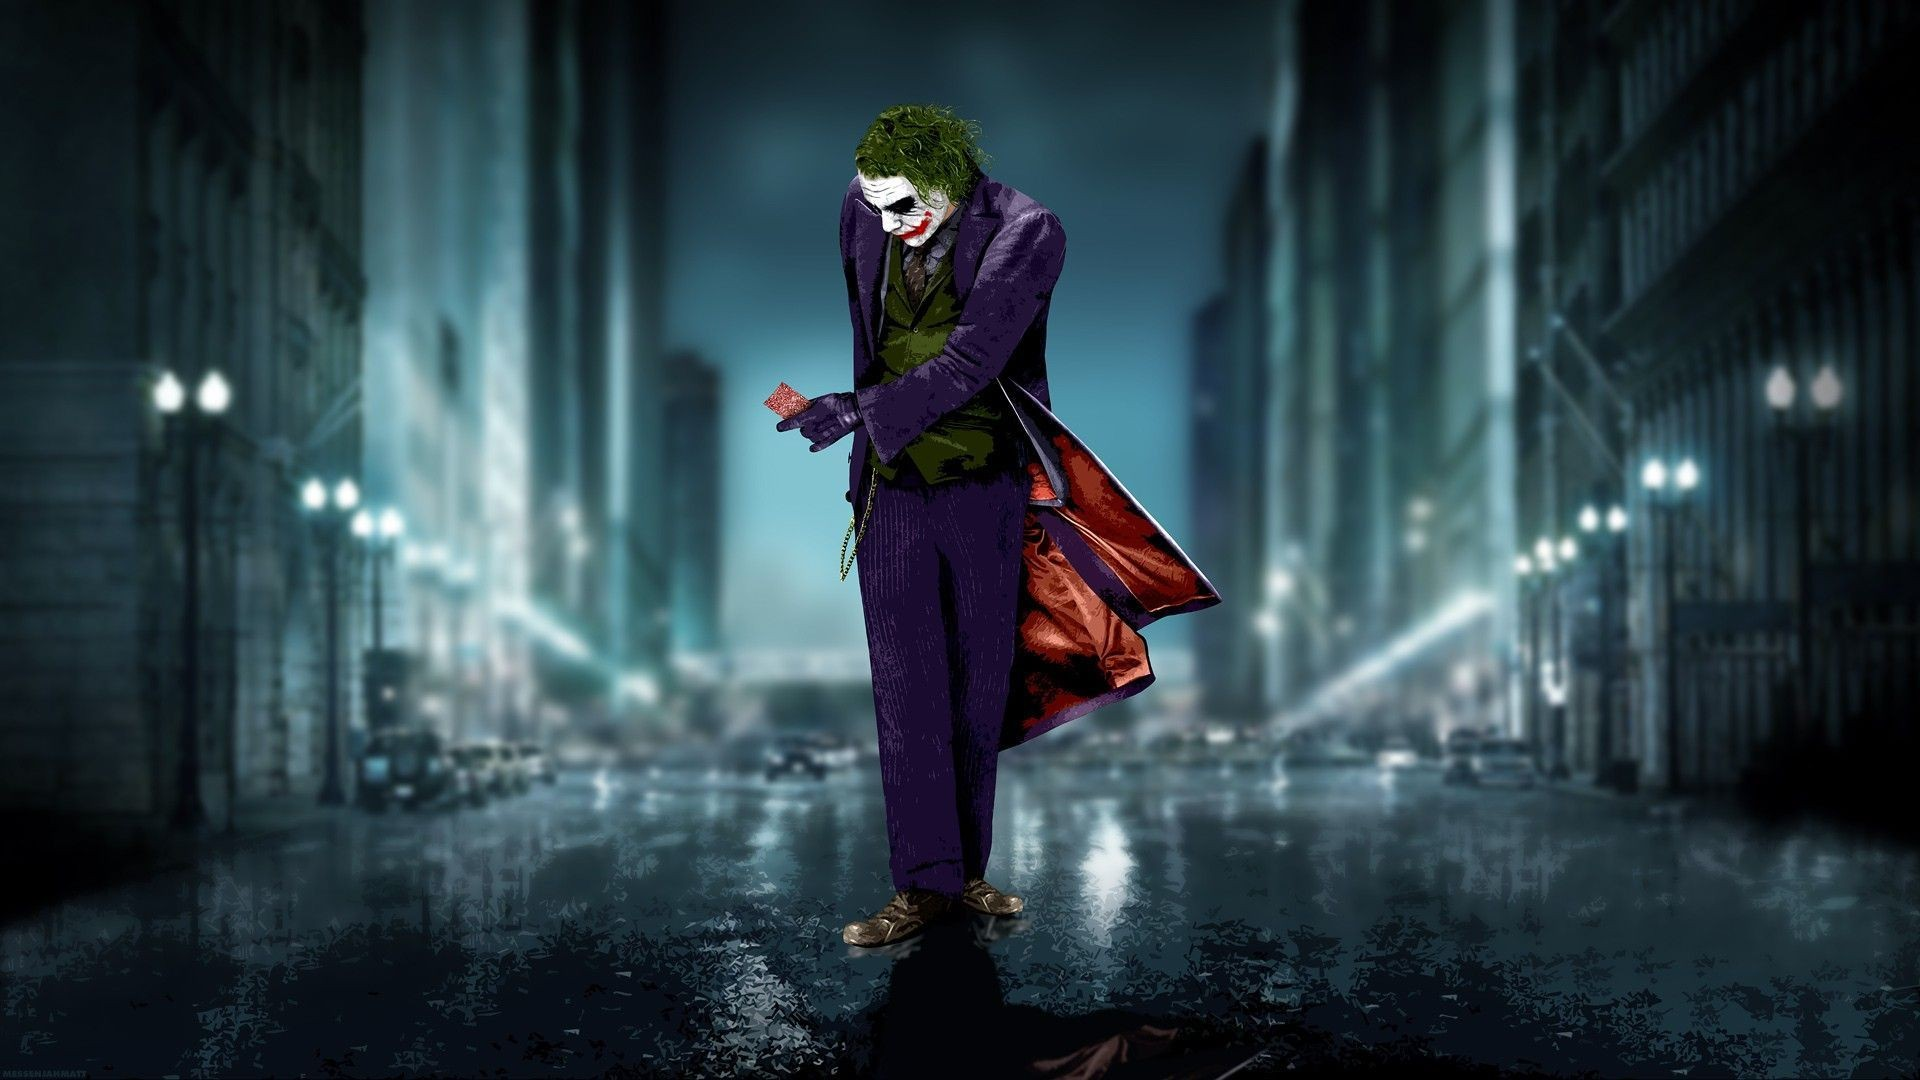 joker wallpaper dark